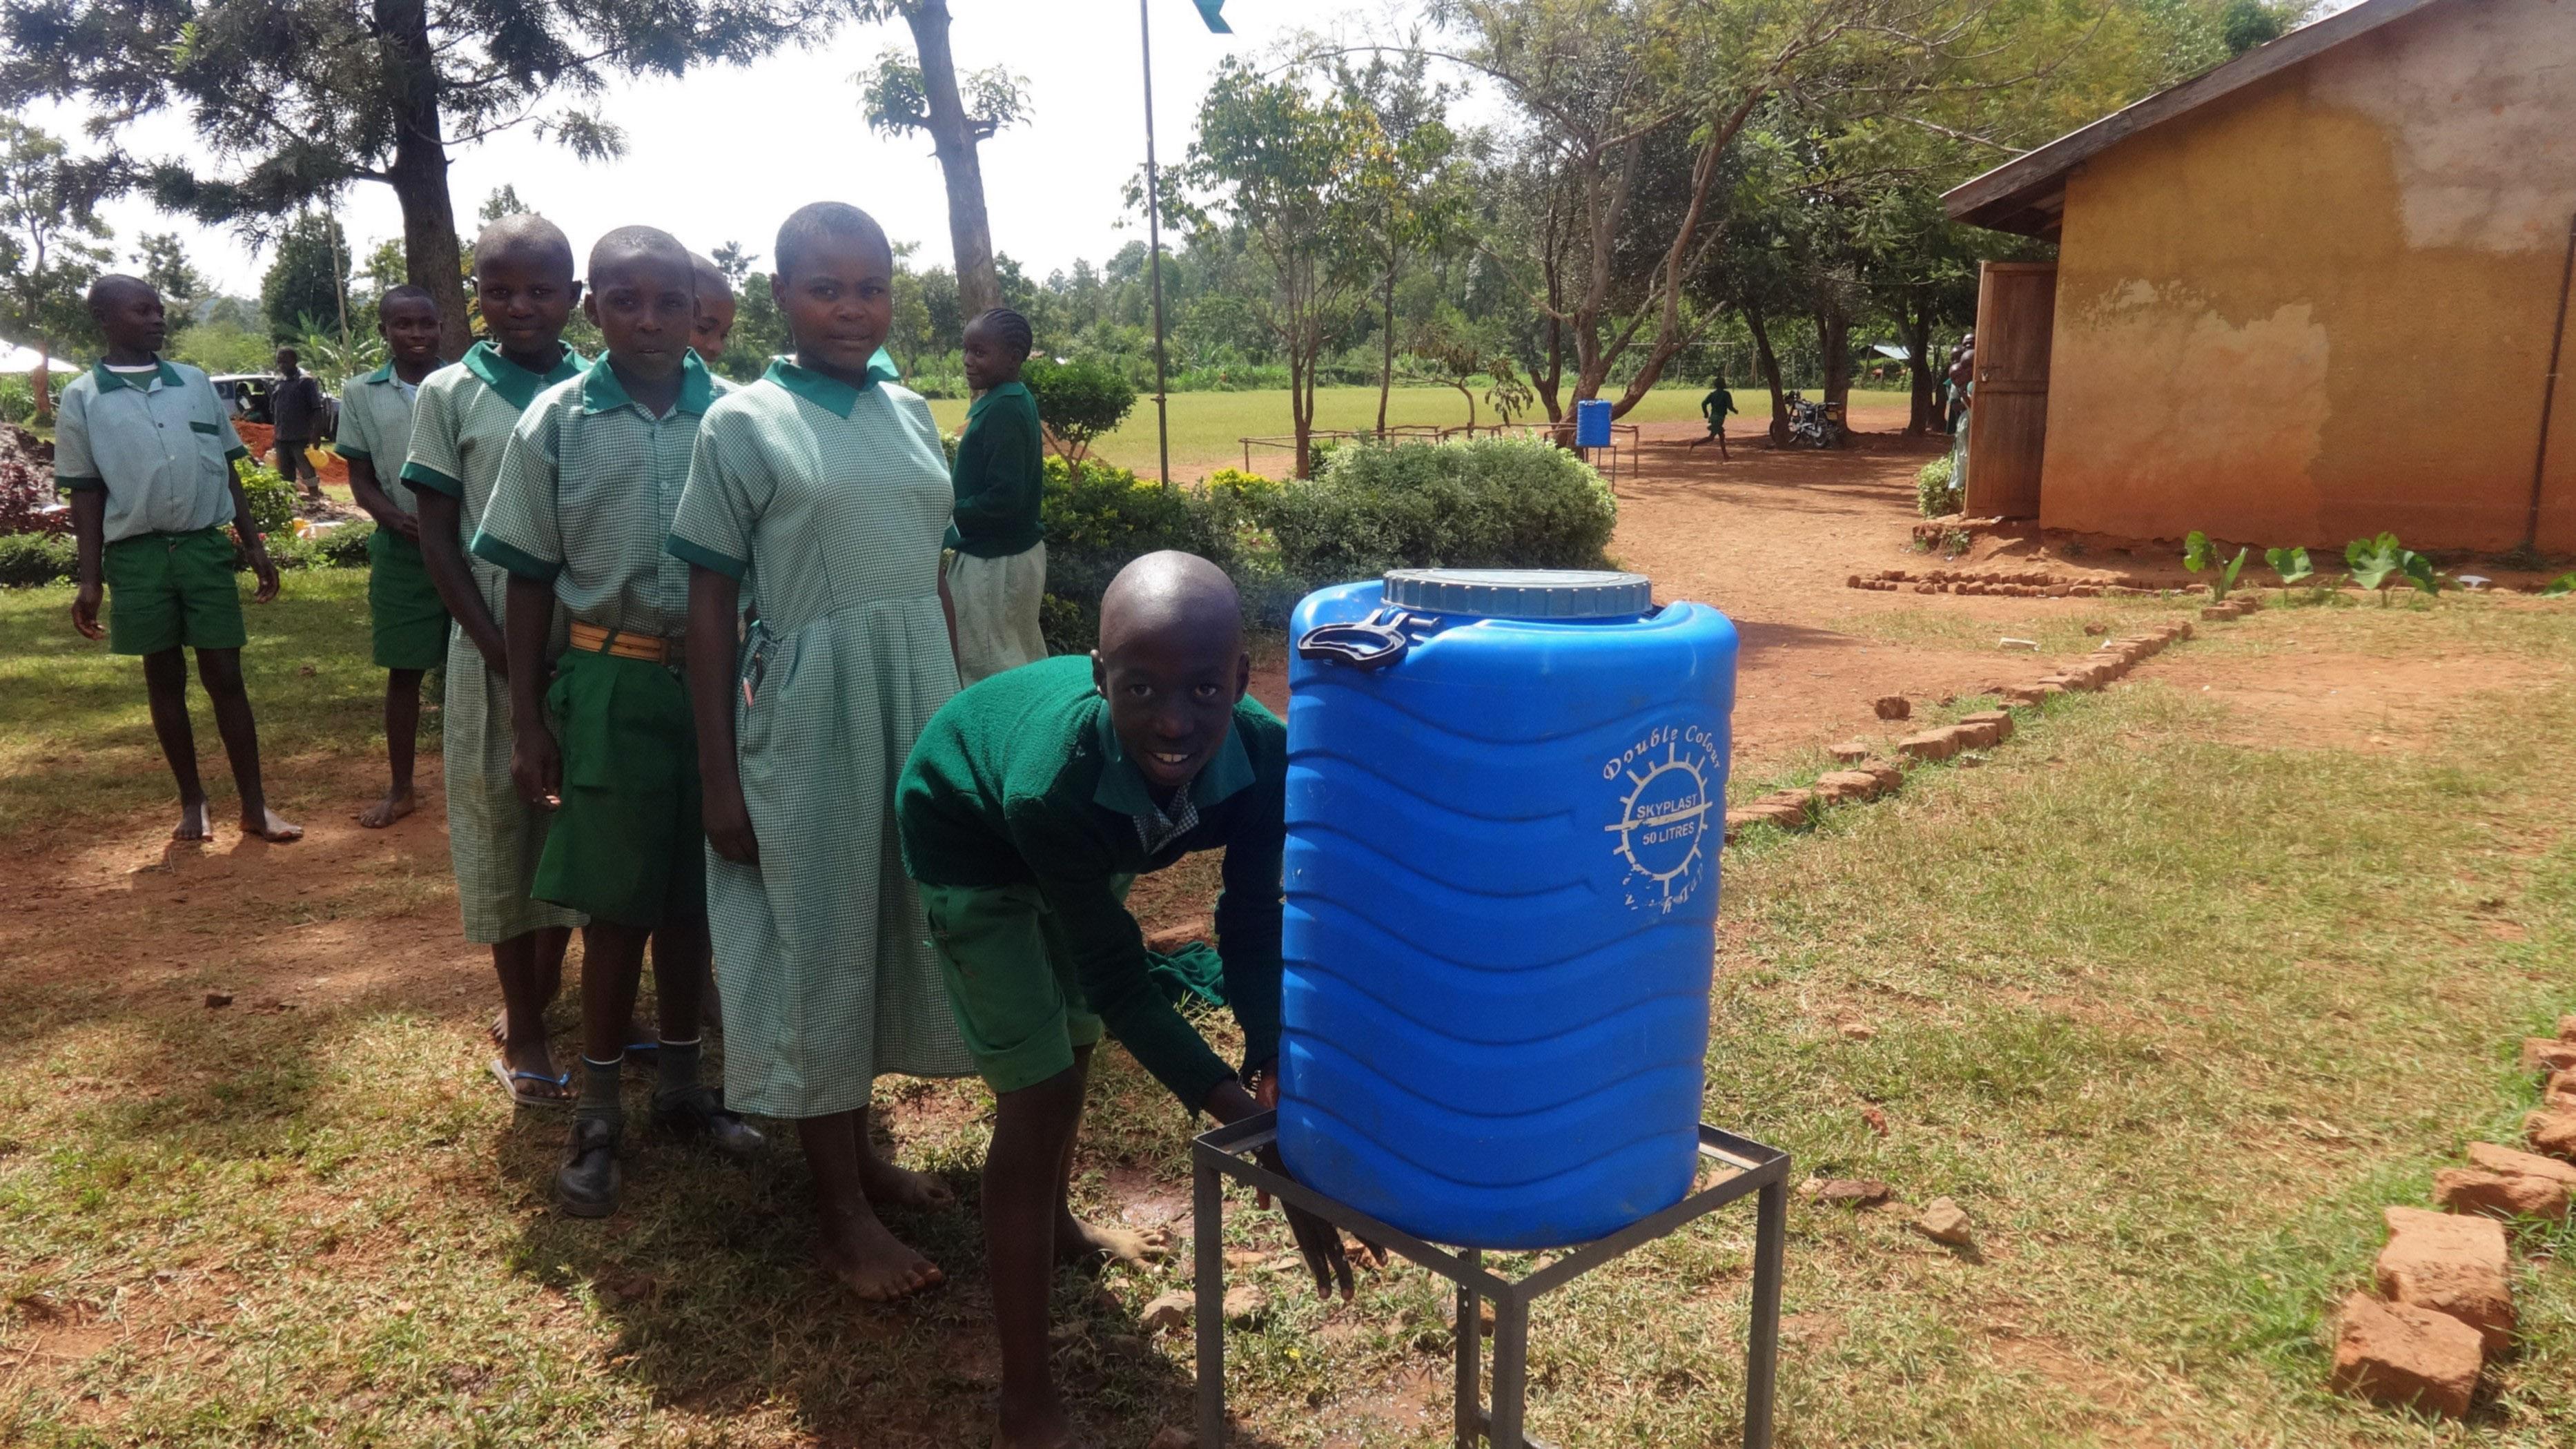 15 kenya4677 hand-washing station